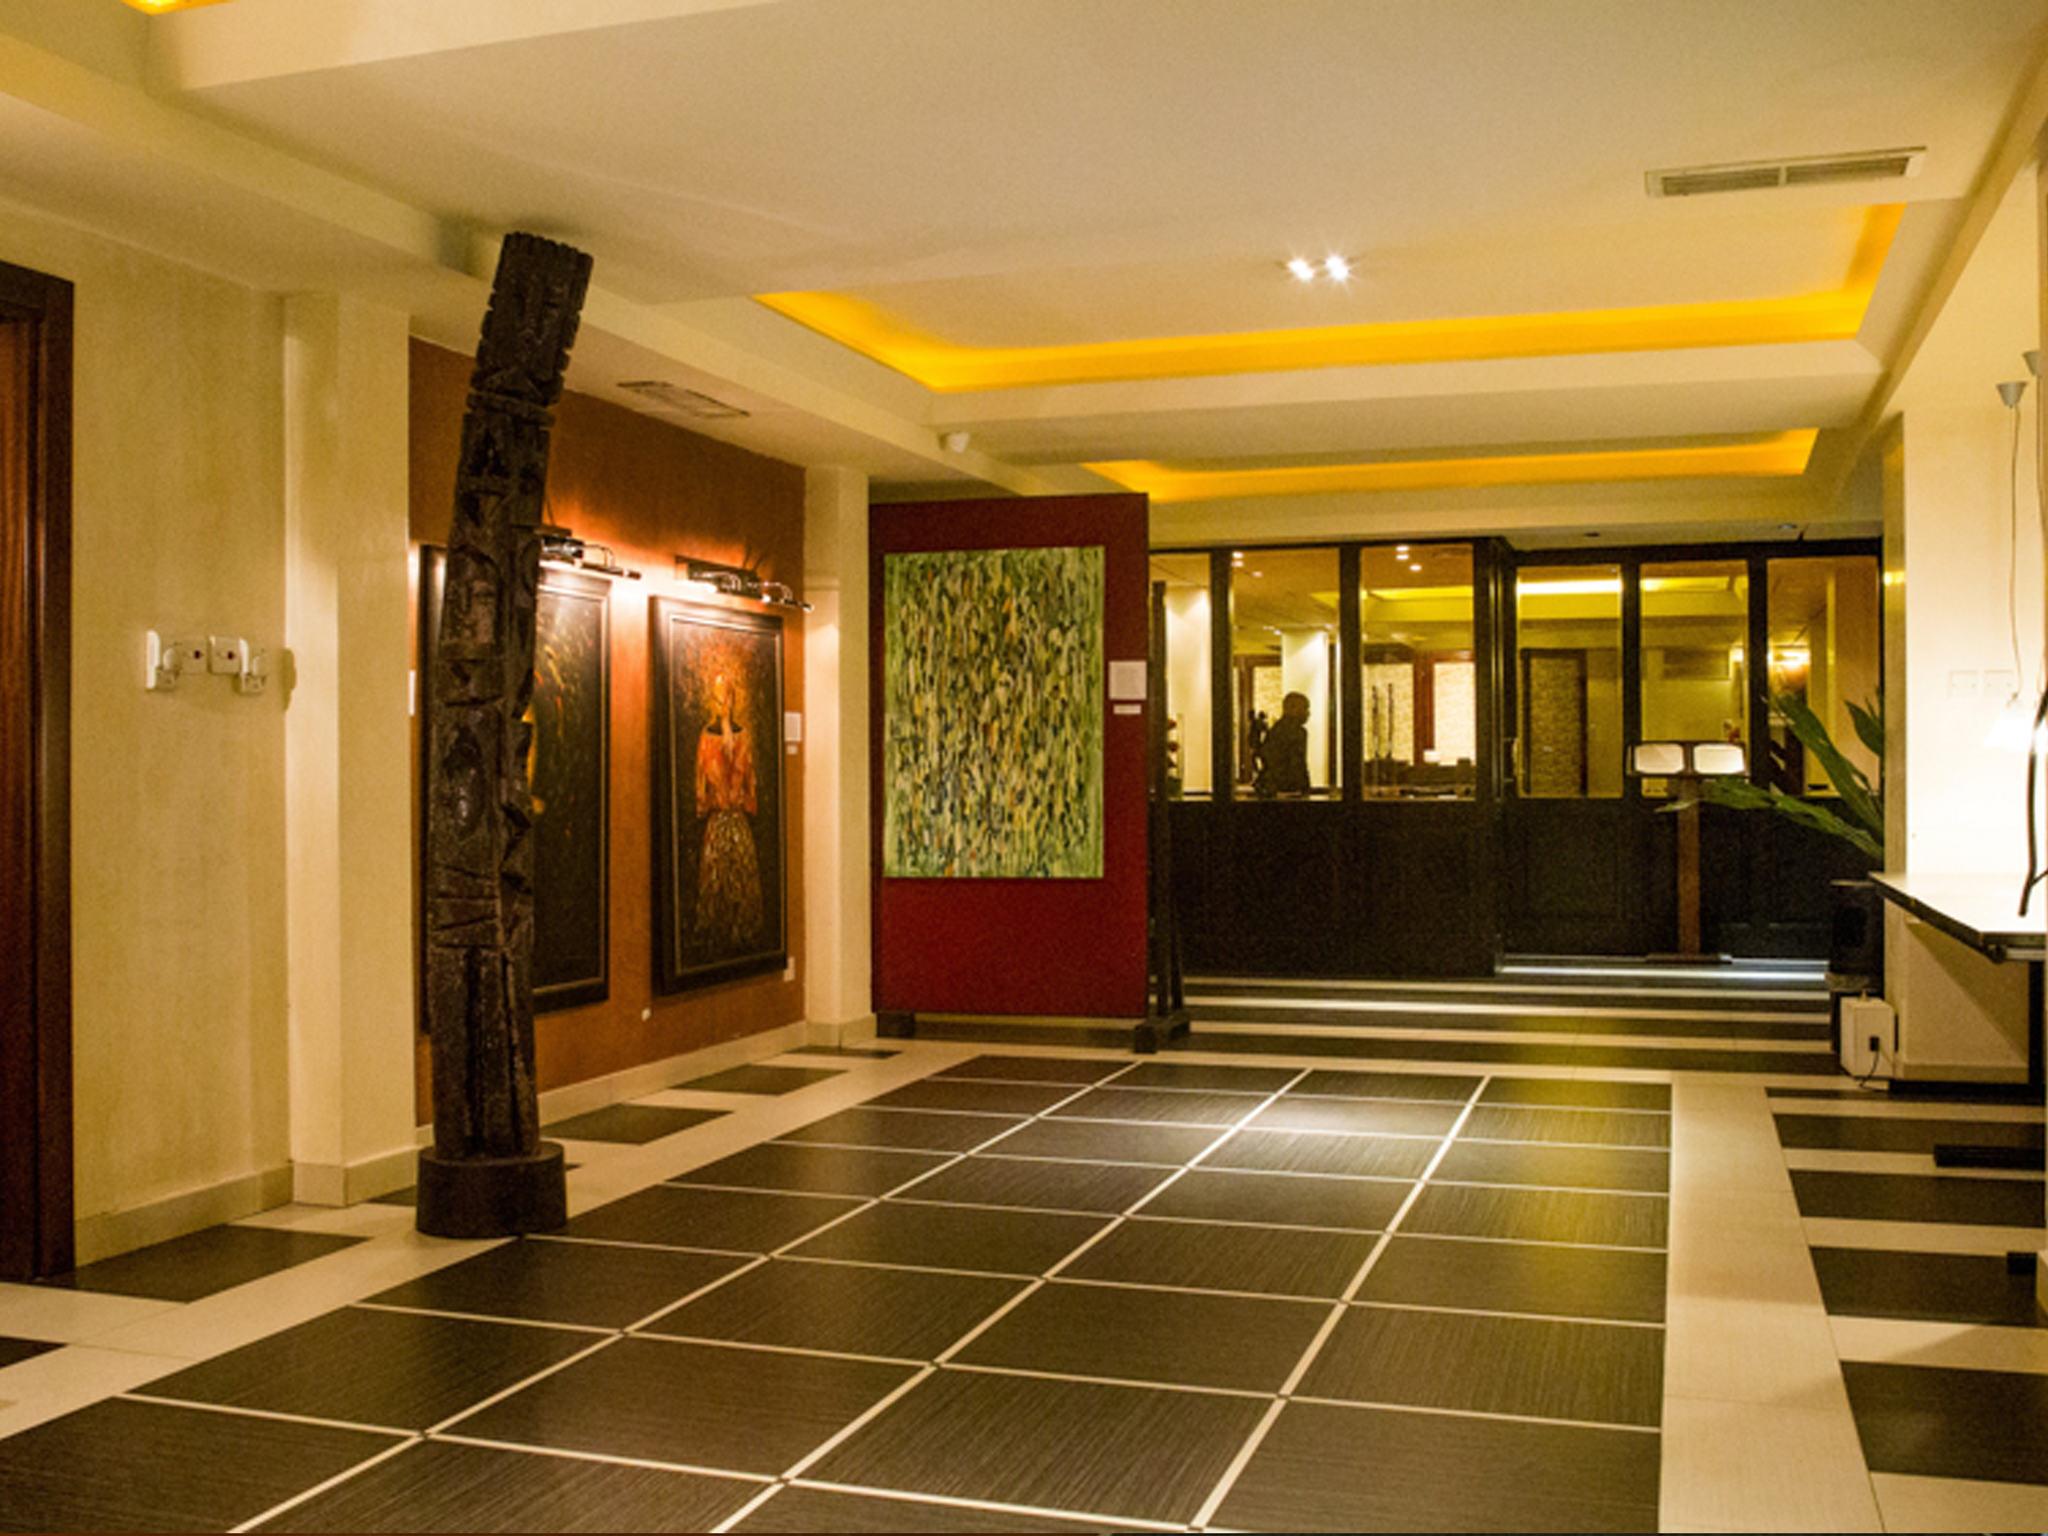 Hotel - Hotel Moorhouse Ikoyi Lagos - MGallery by Sofitel